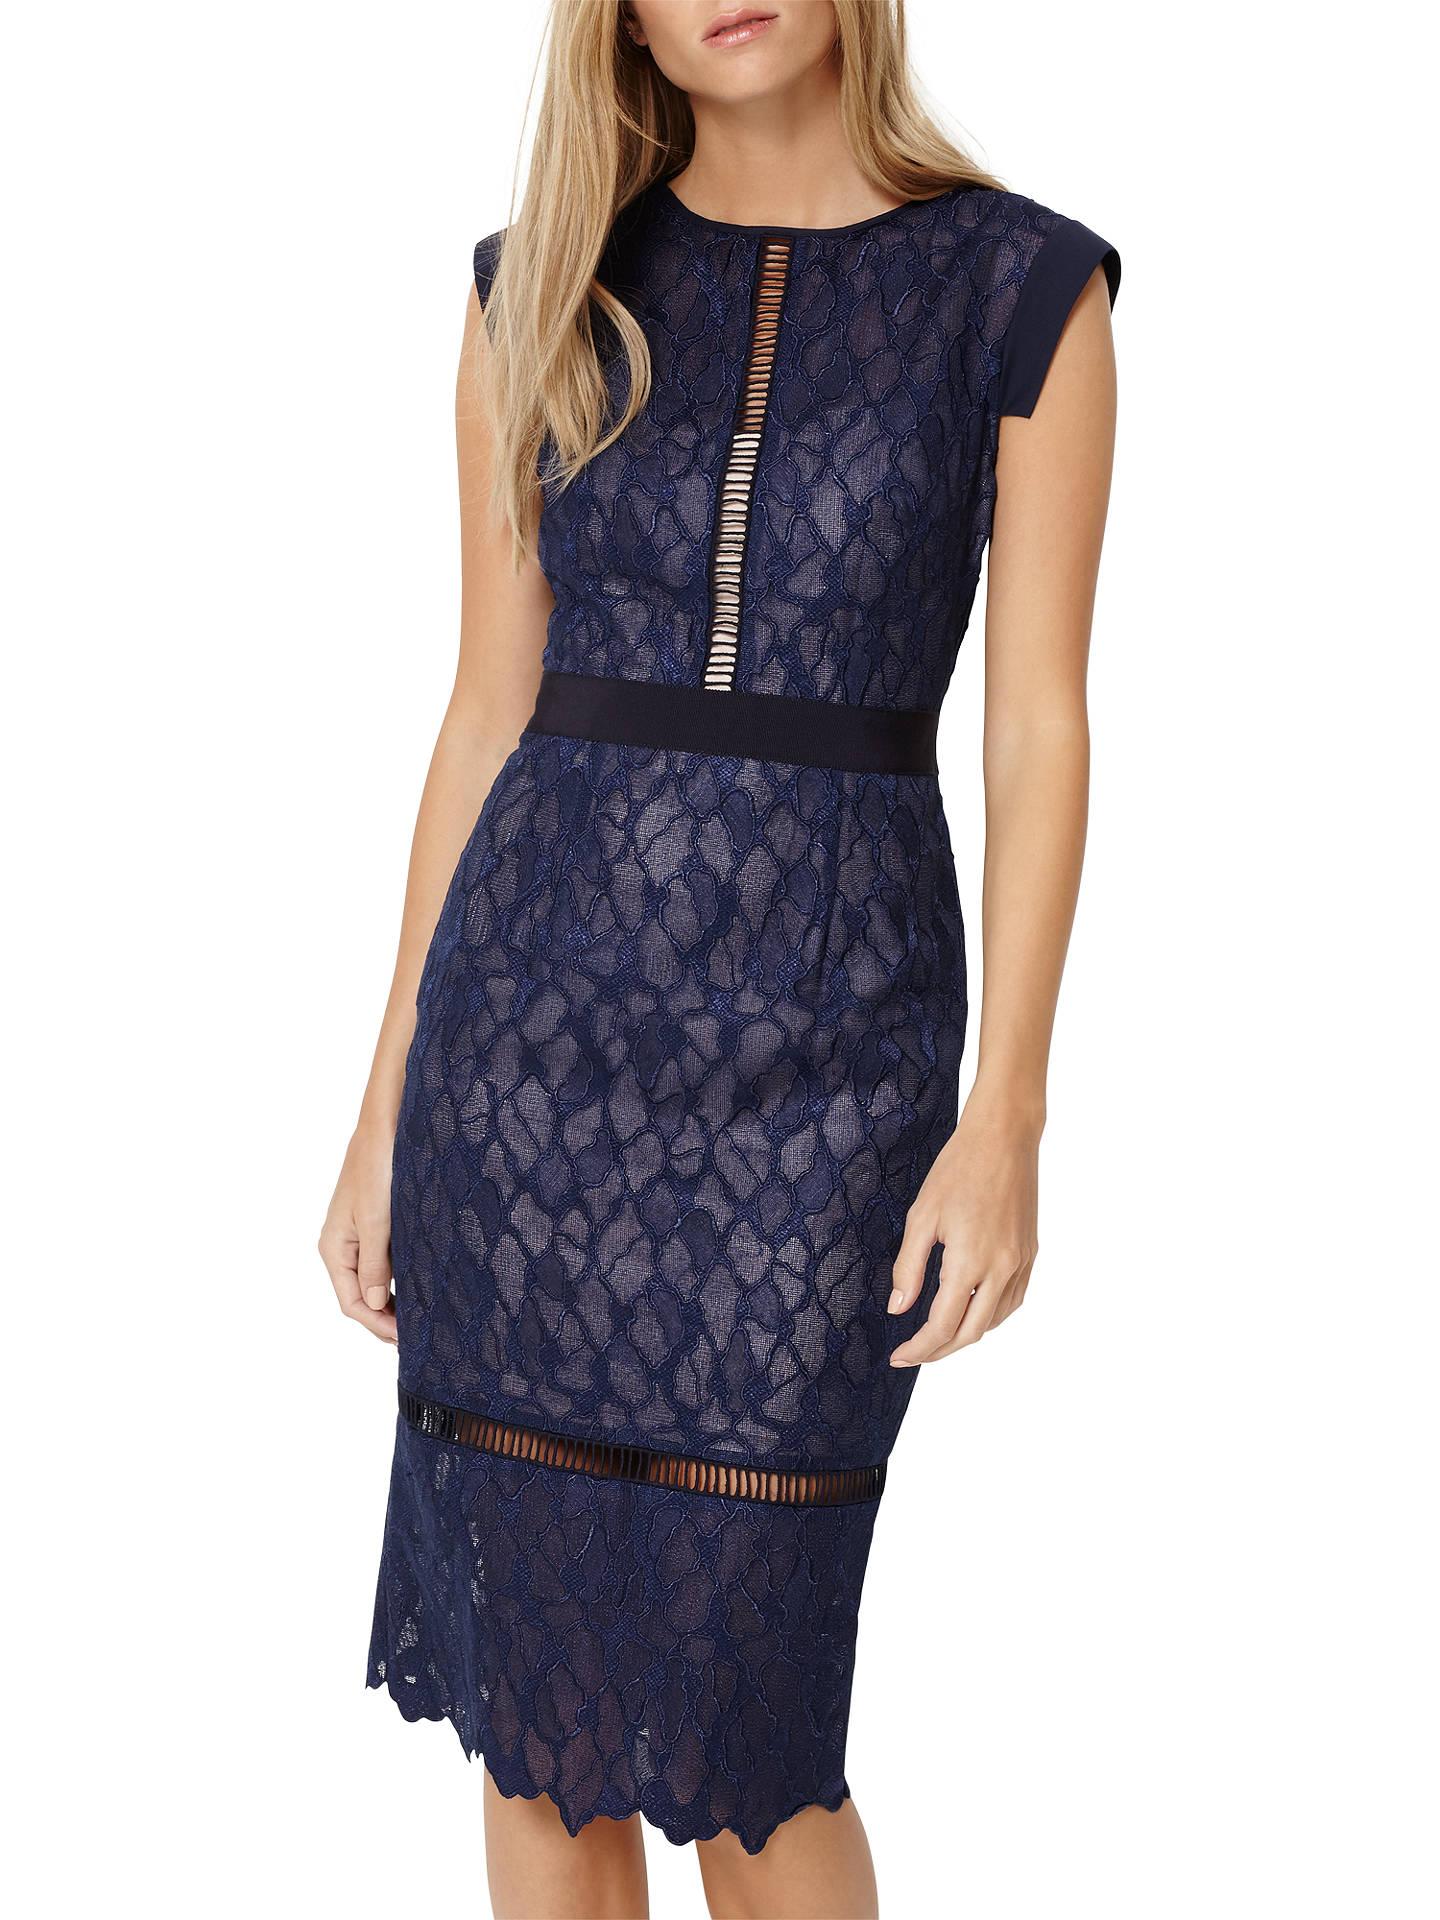 a514210e3e56 Buy Damsel in a dress Maneki Lace Dress, Navy, 8 Online at johnlewis.